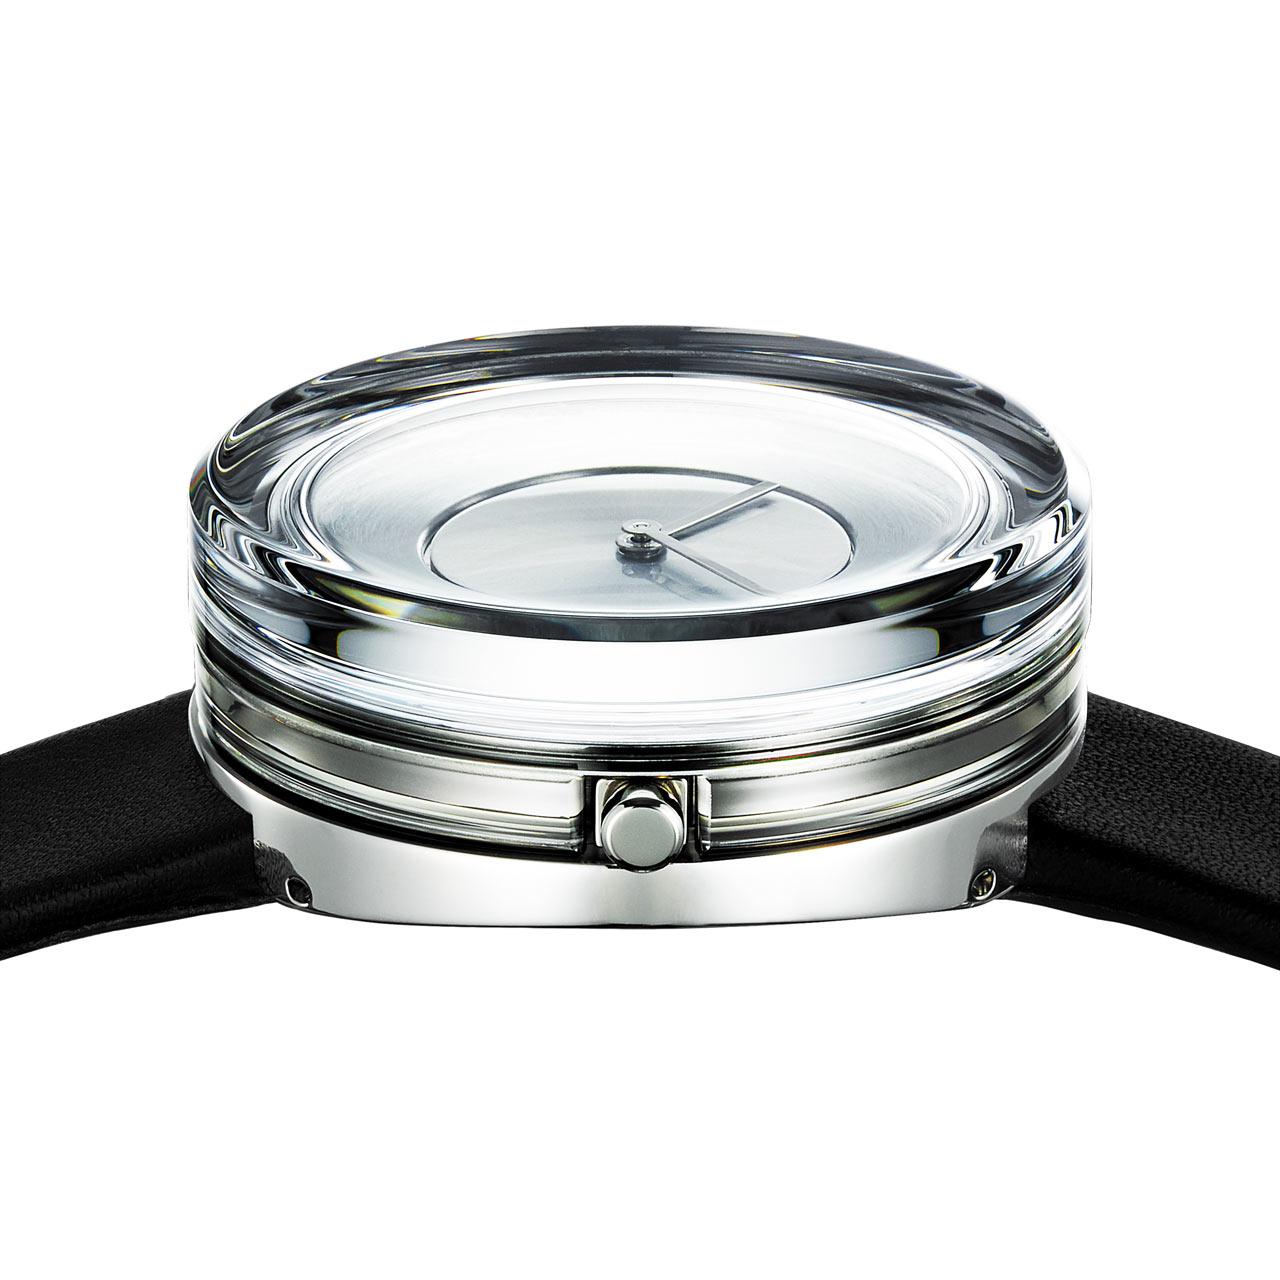 Tokujin Yoshioka Designed a Glass Watch for ISSEY MIYAKE Watch Project